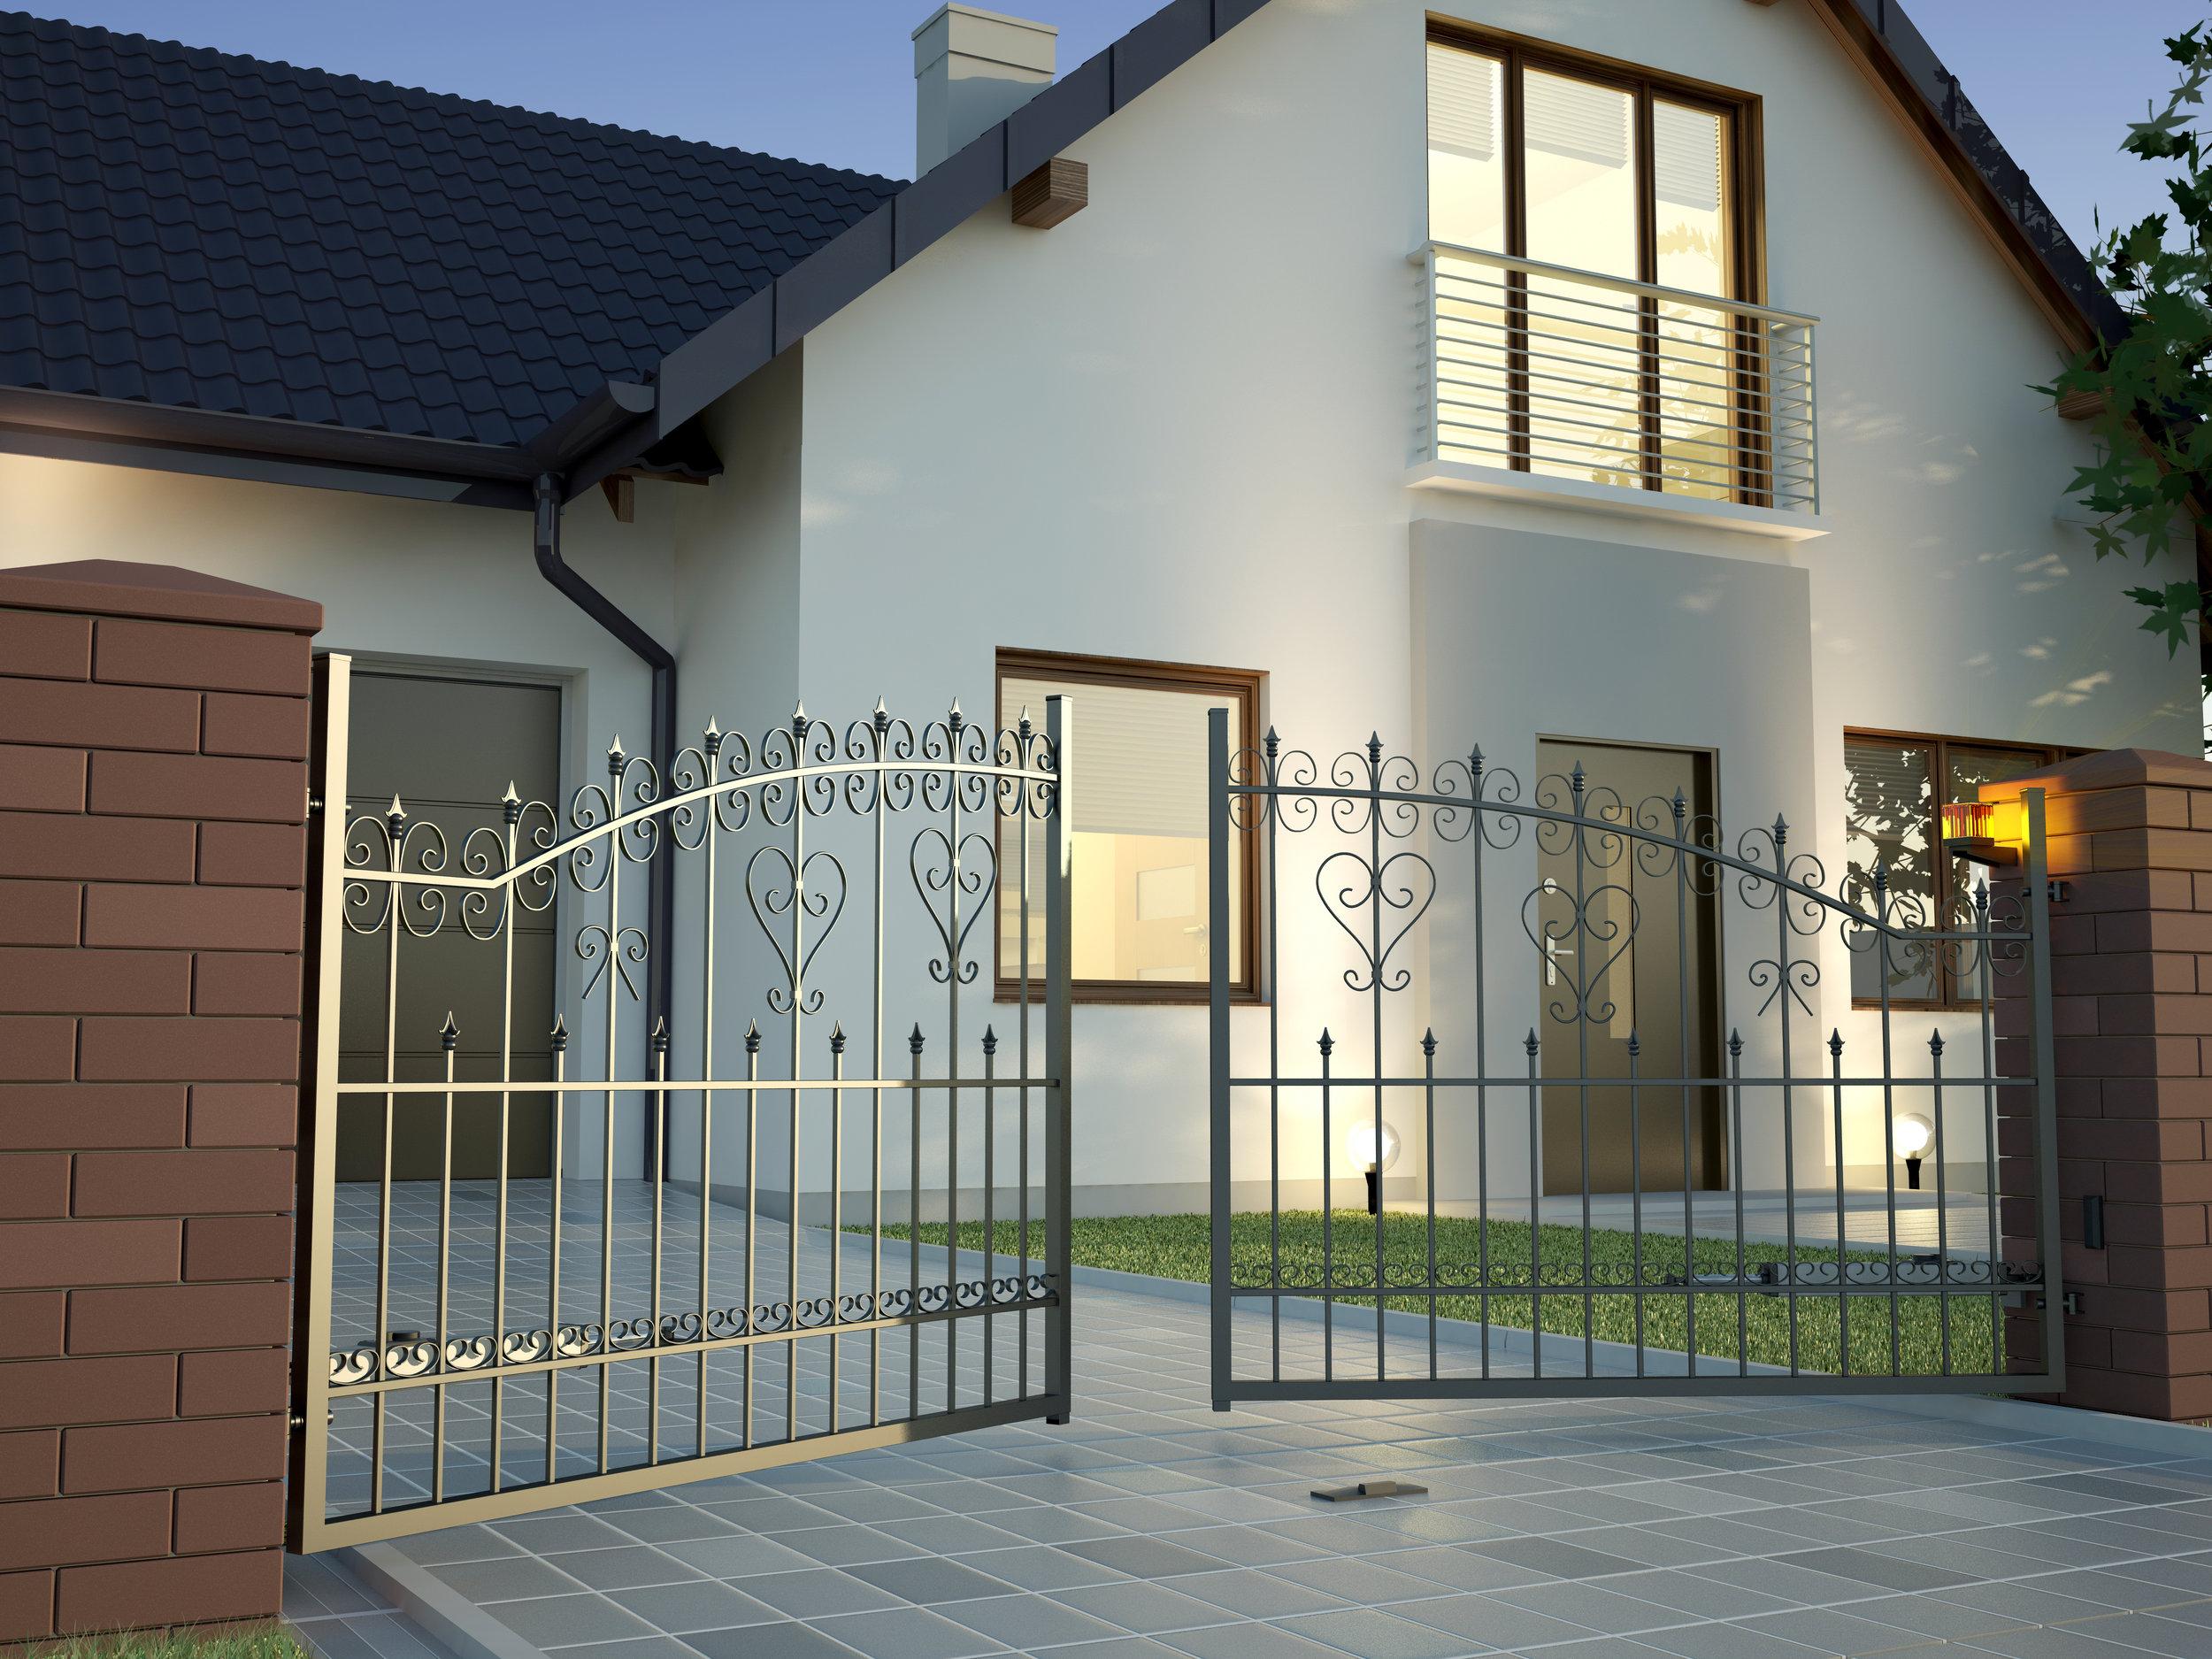 residential gate.jpeg